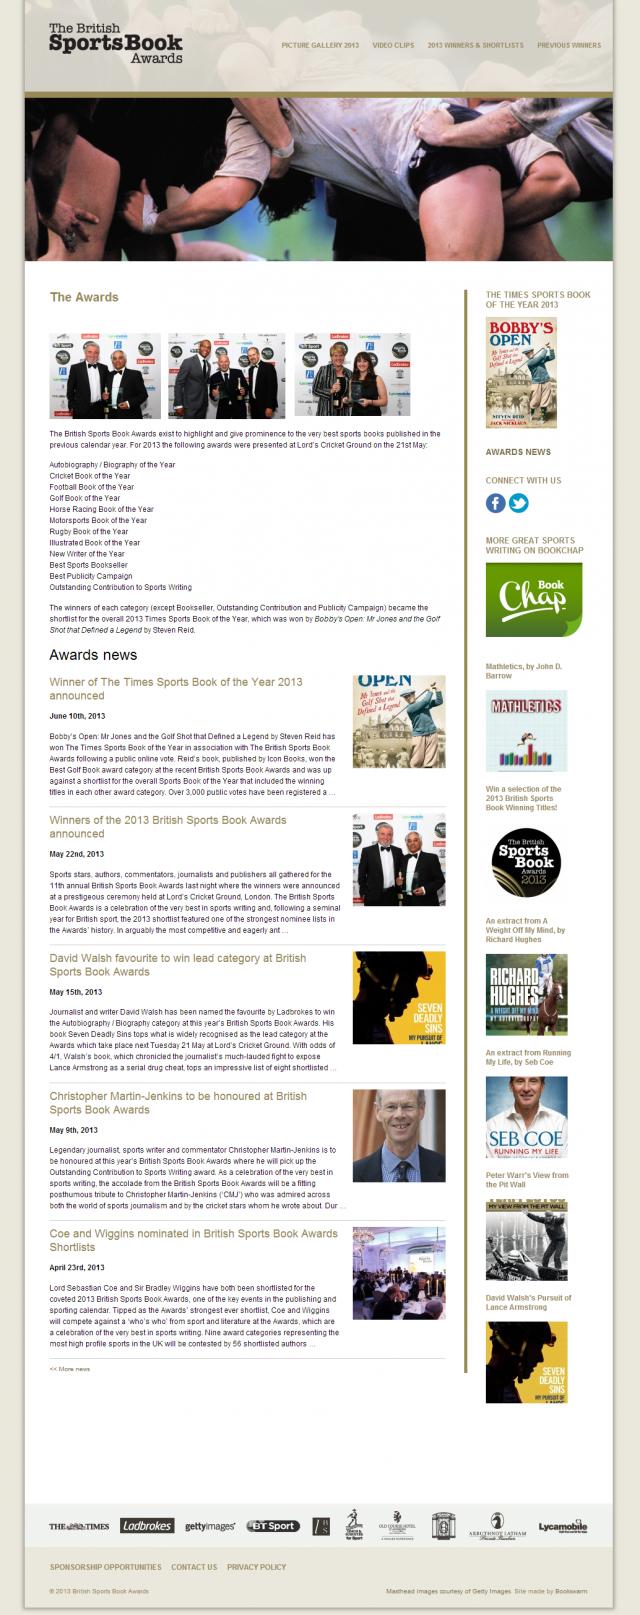 British Sports Book Awards 2013